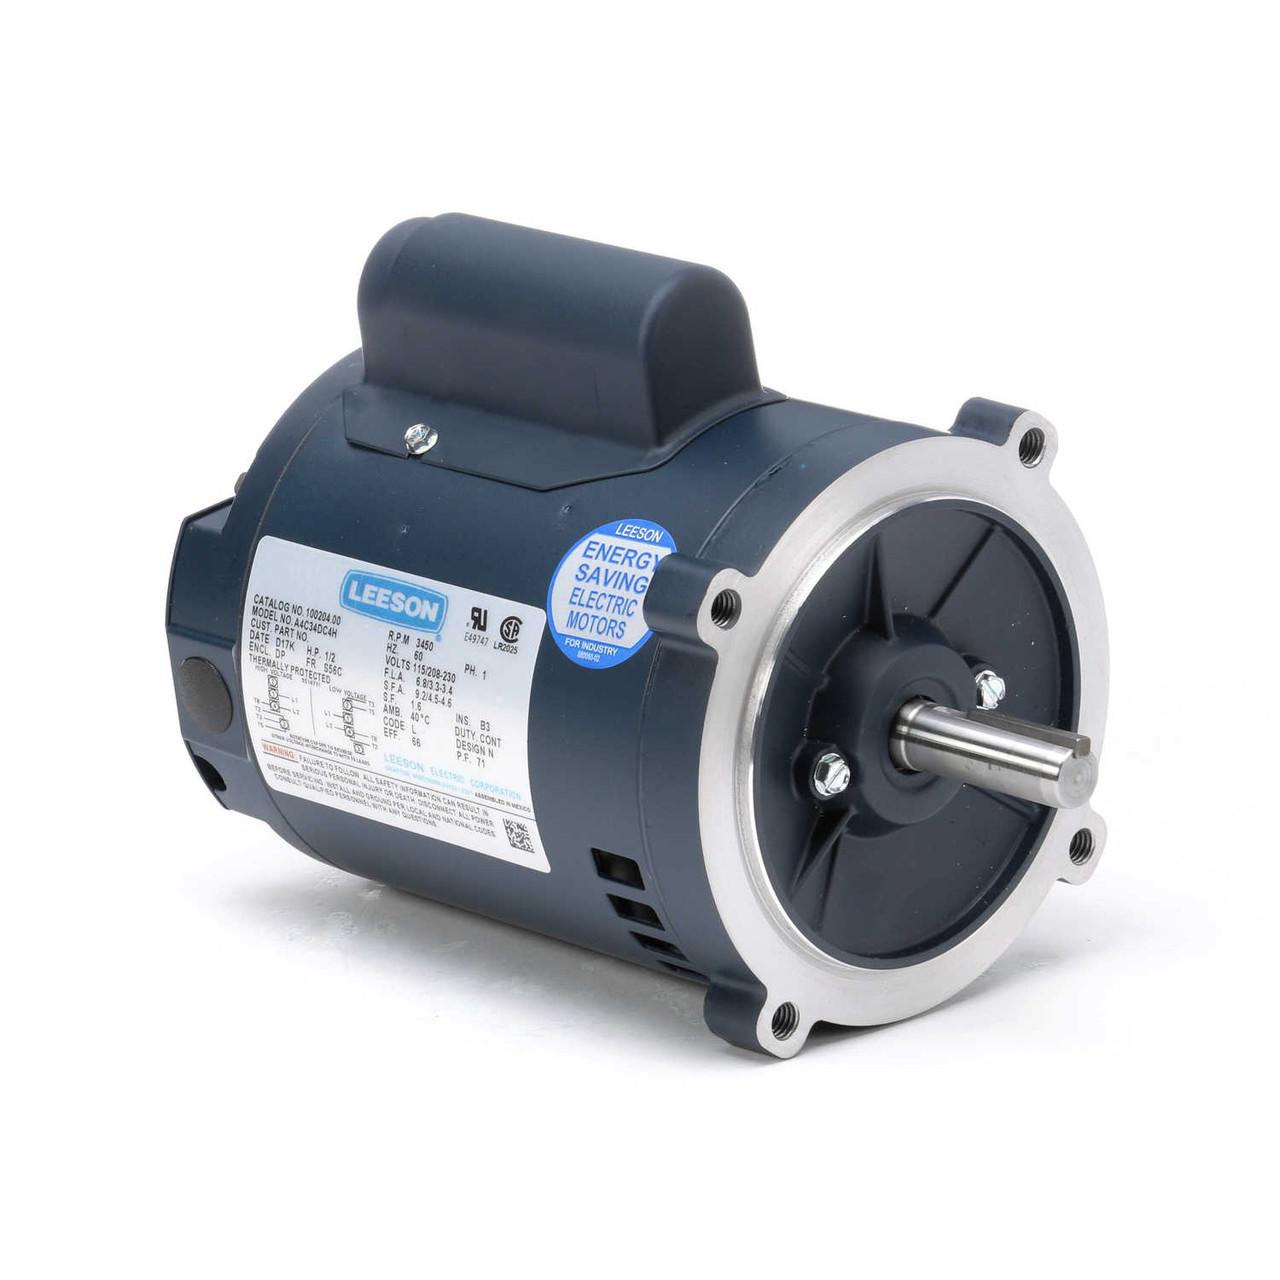 1/2 hp 3450 RPM 56C 115/208-230V Well Pump Motor Leeson # 100204Electric Motor Warehouse